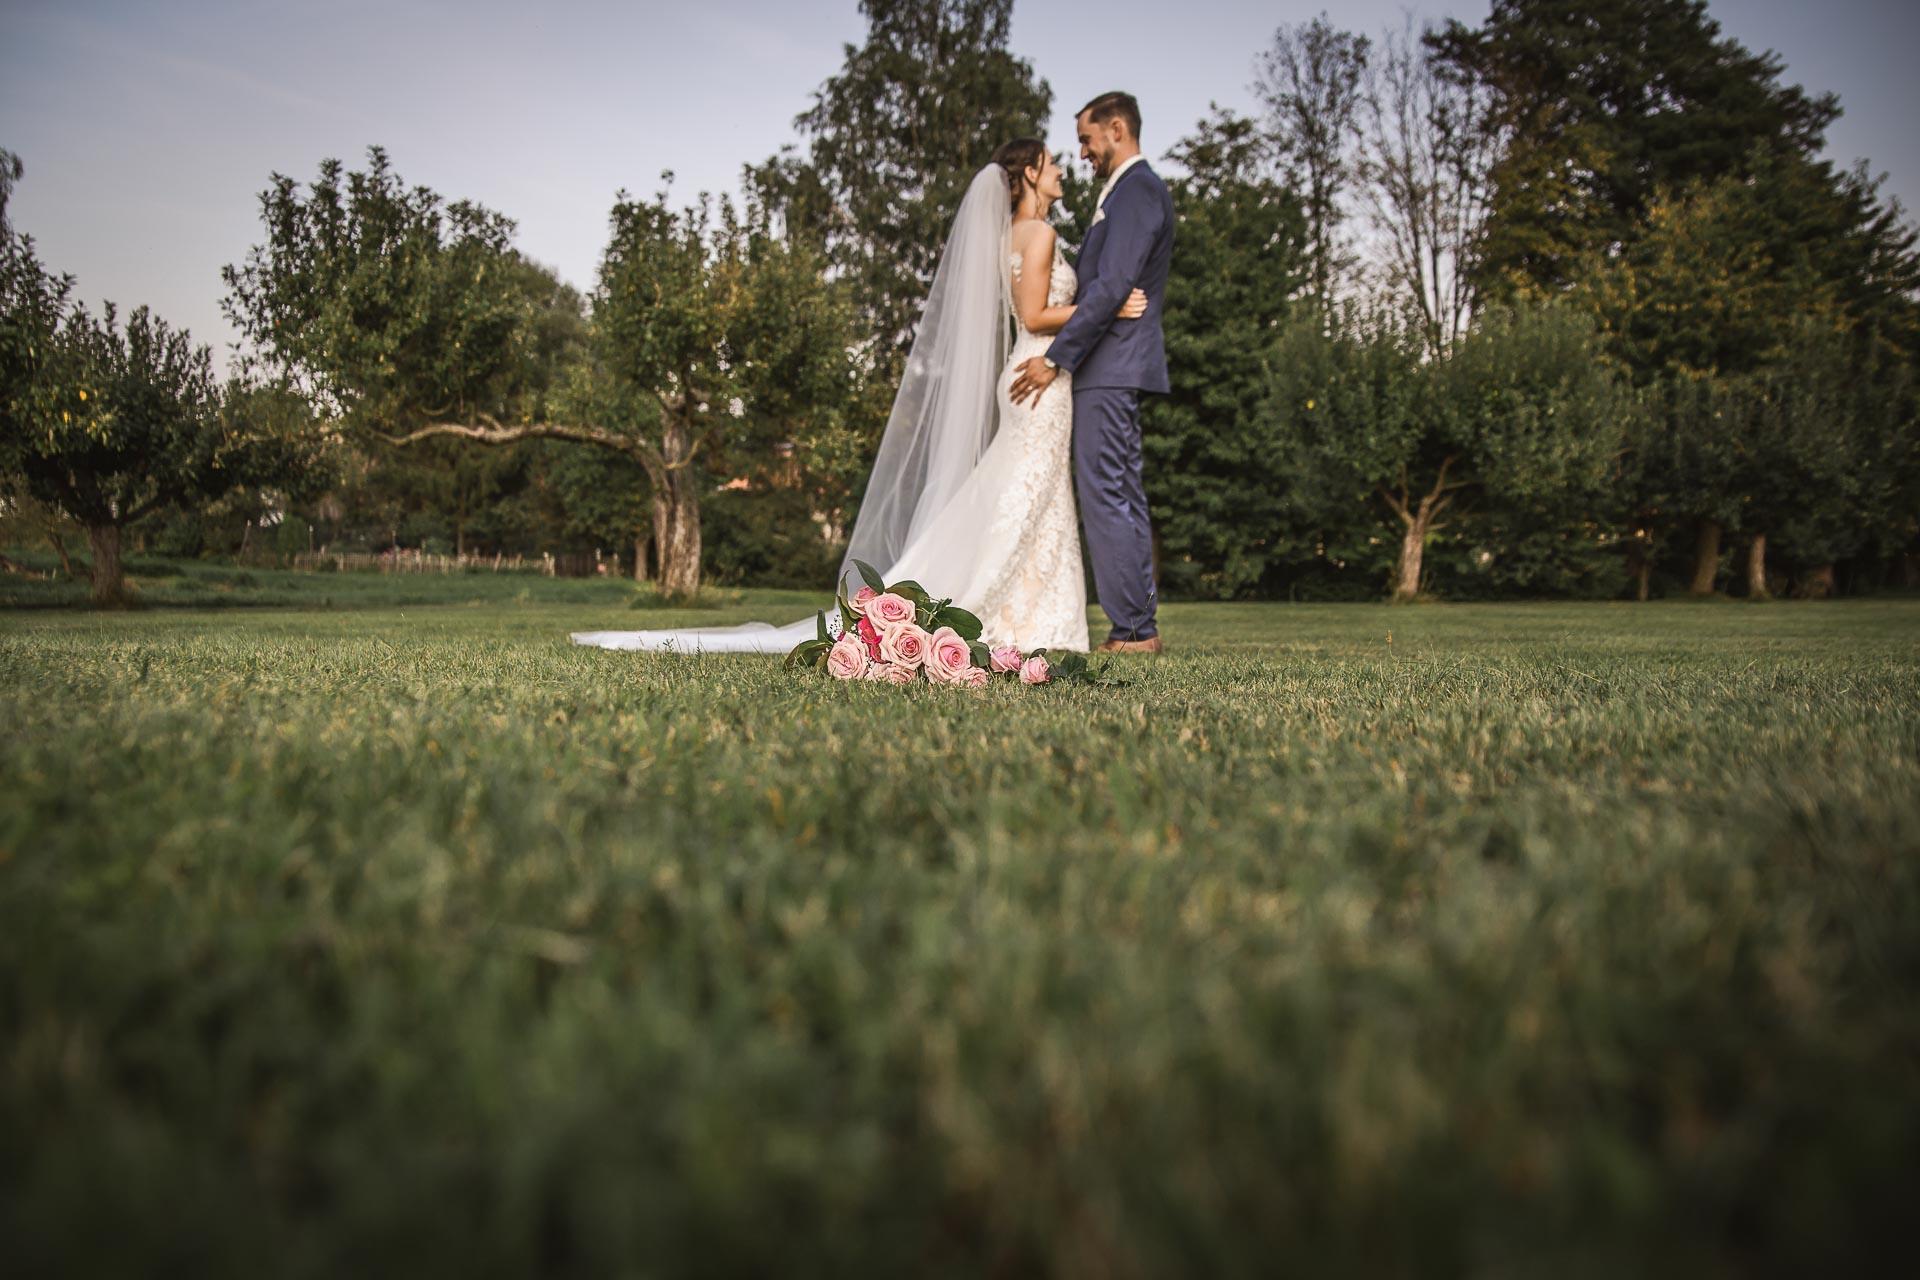 svatební-fotograf-wedding-svatebni-video-orlík-vltava-kostel-statek-stodola-boho-svatba-Beautyfoto-512